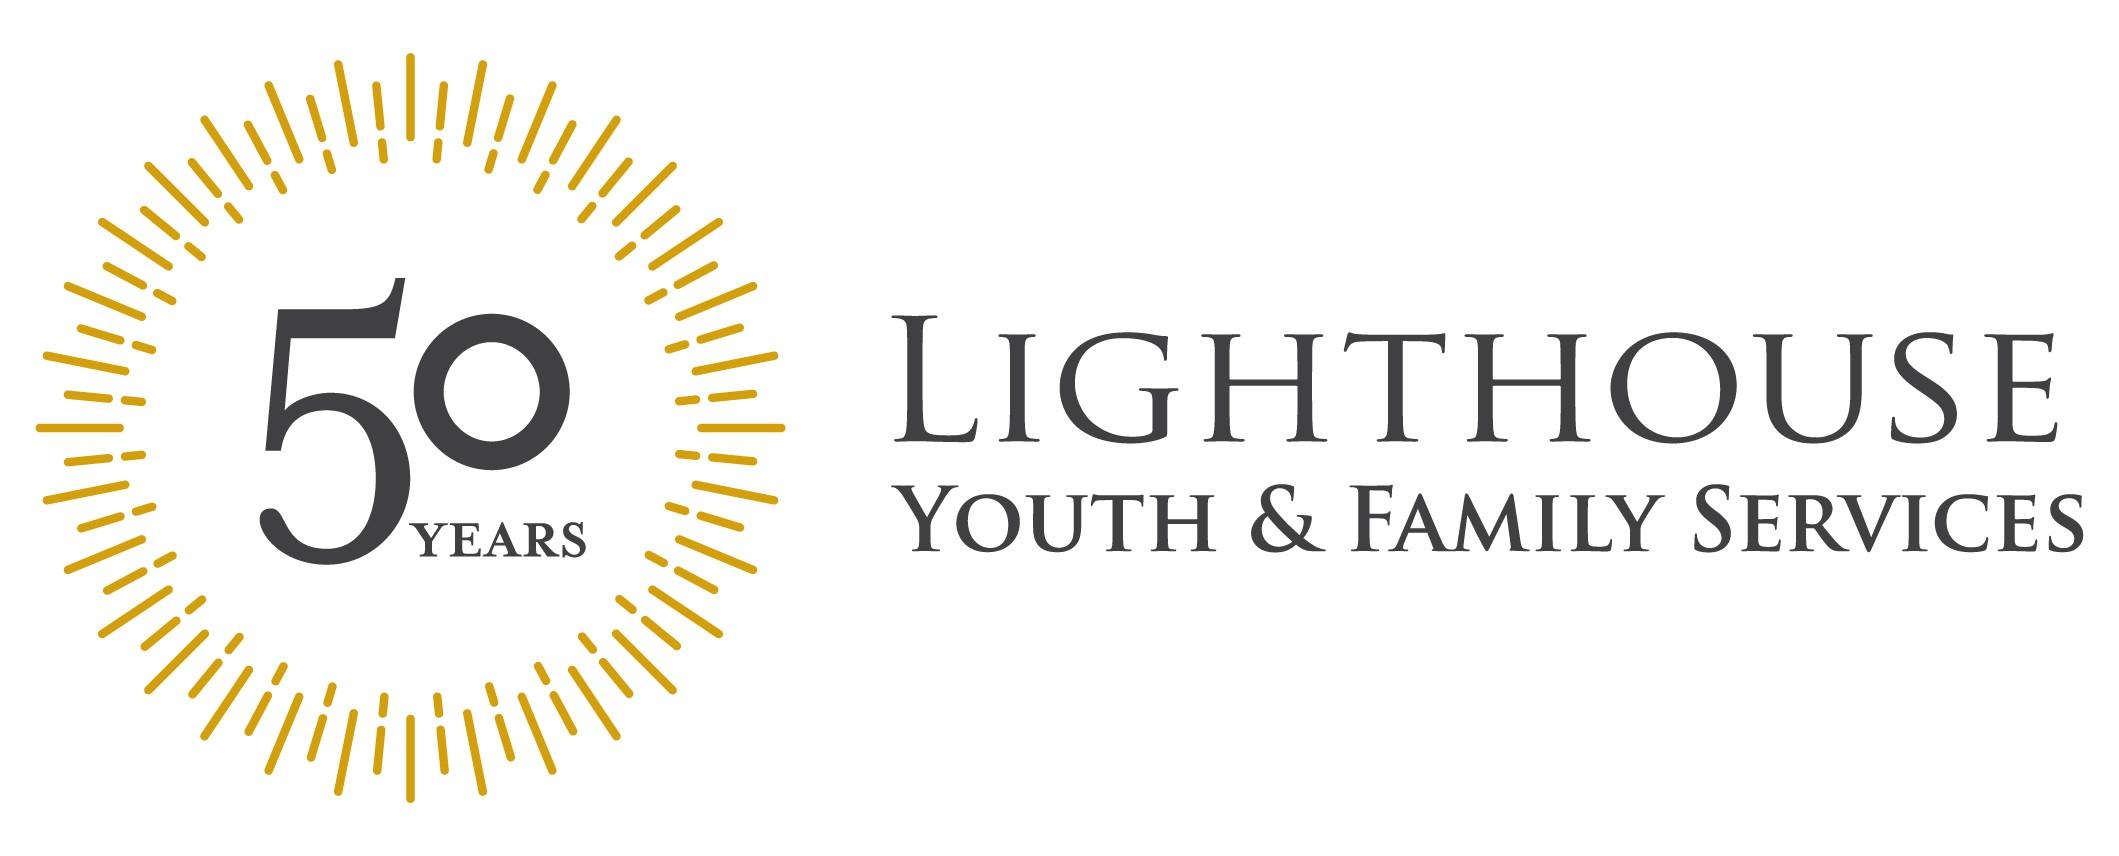 Lighthouse Youth Services | LinkedIn